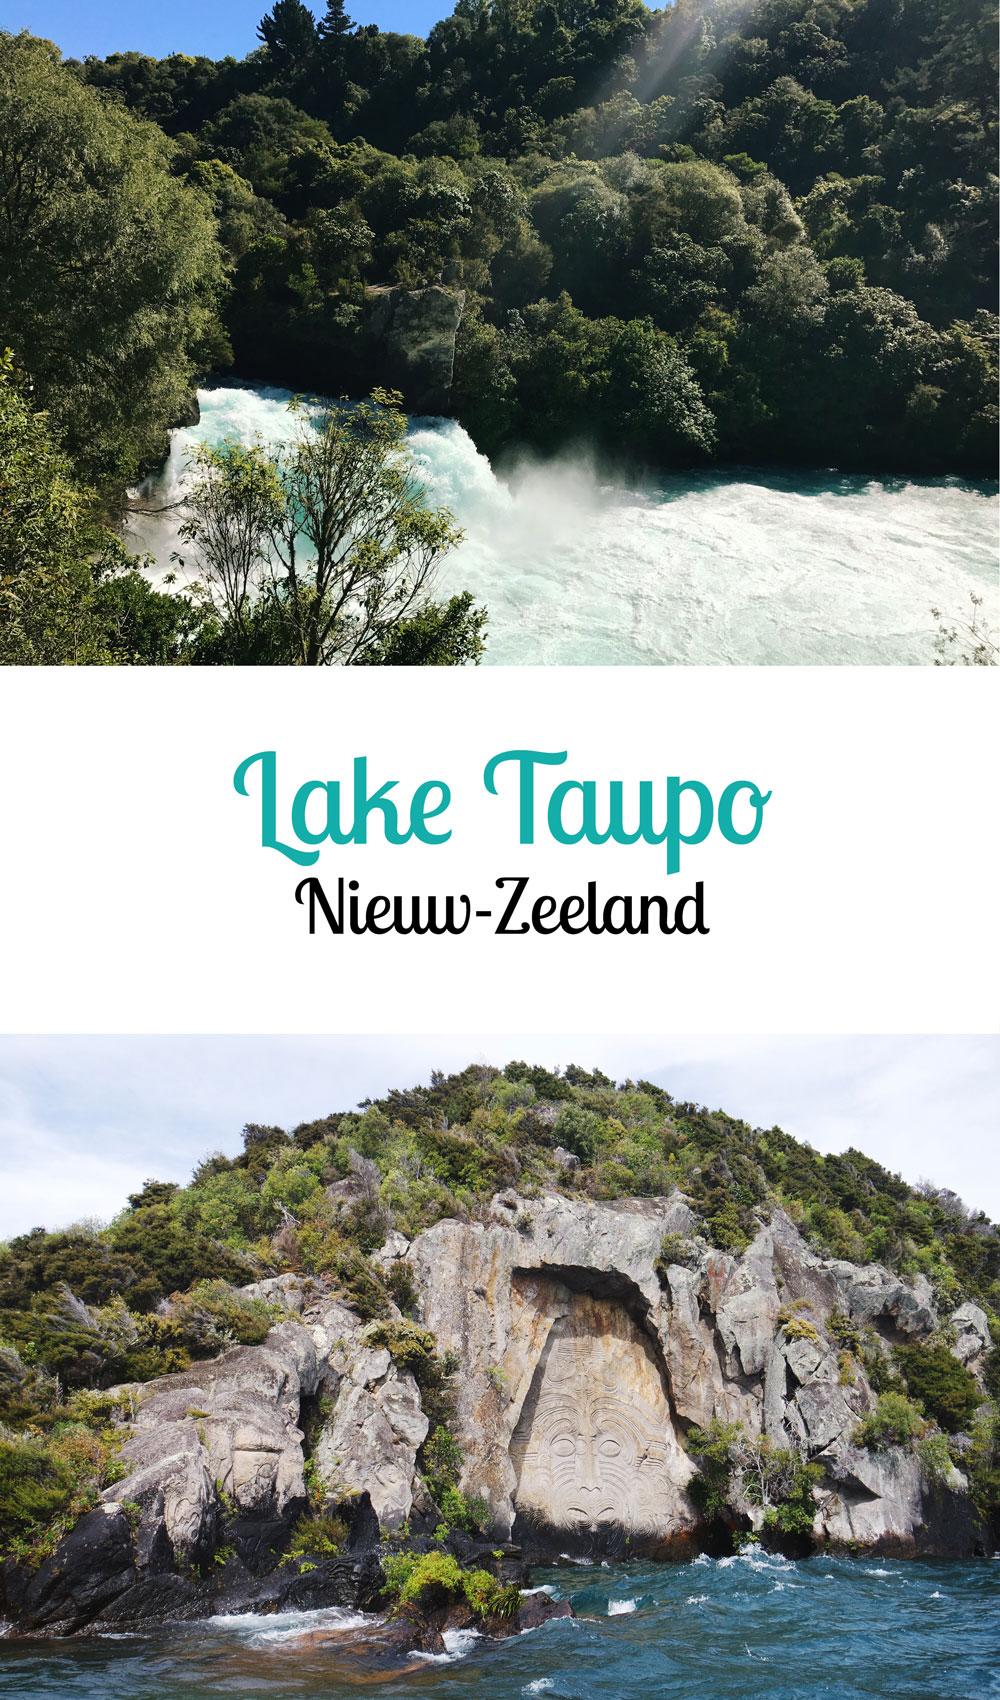 Nieuw-Zeeland - Taupo